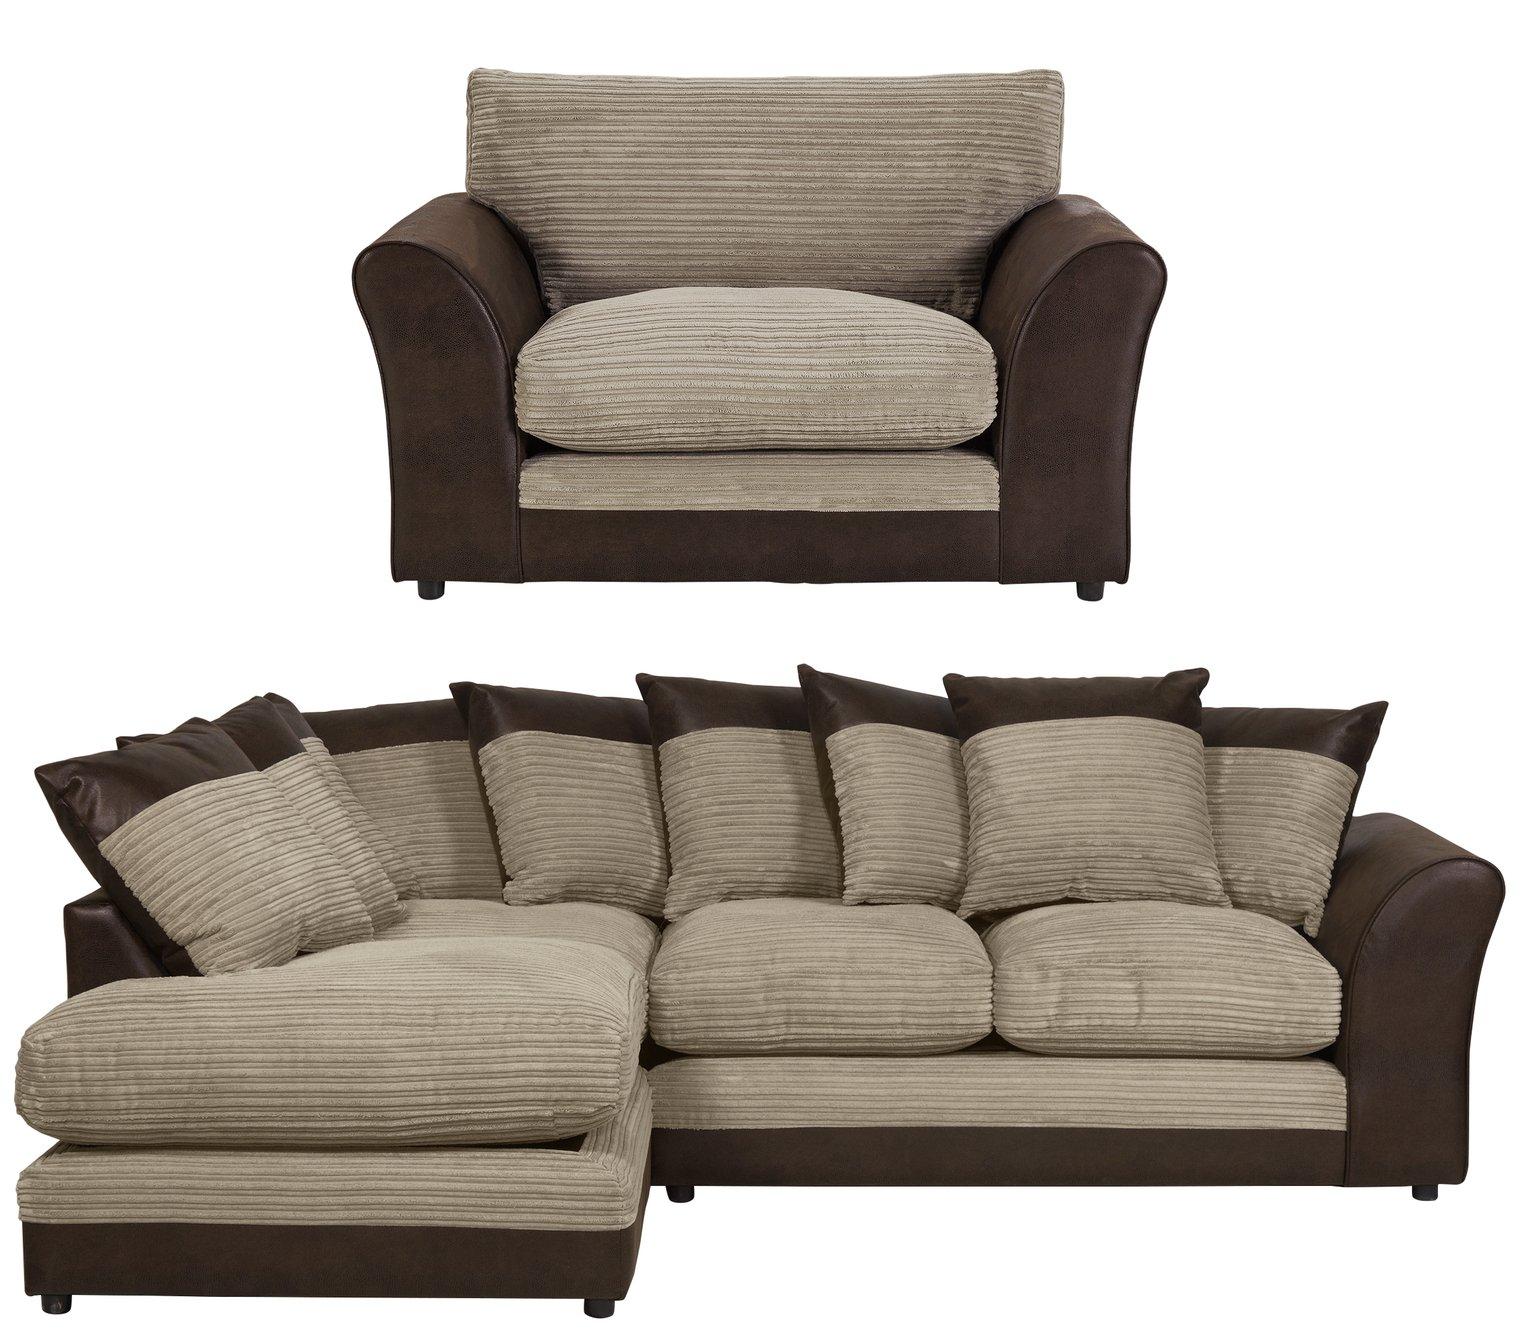 Argos Corner Sofa Jumbo Cord: SALE On HOME Harley Large Left Hand Corner Sofa And Chair